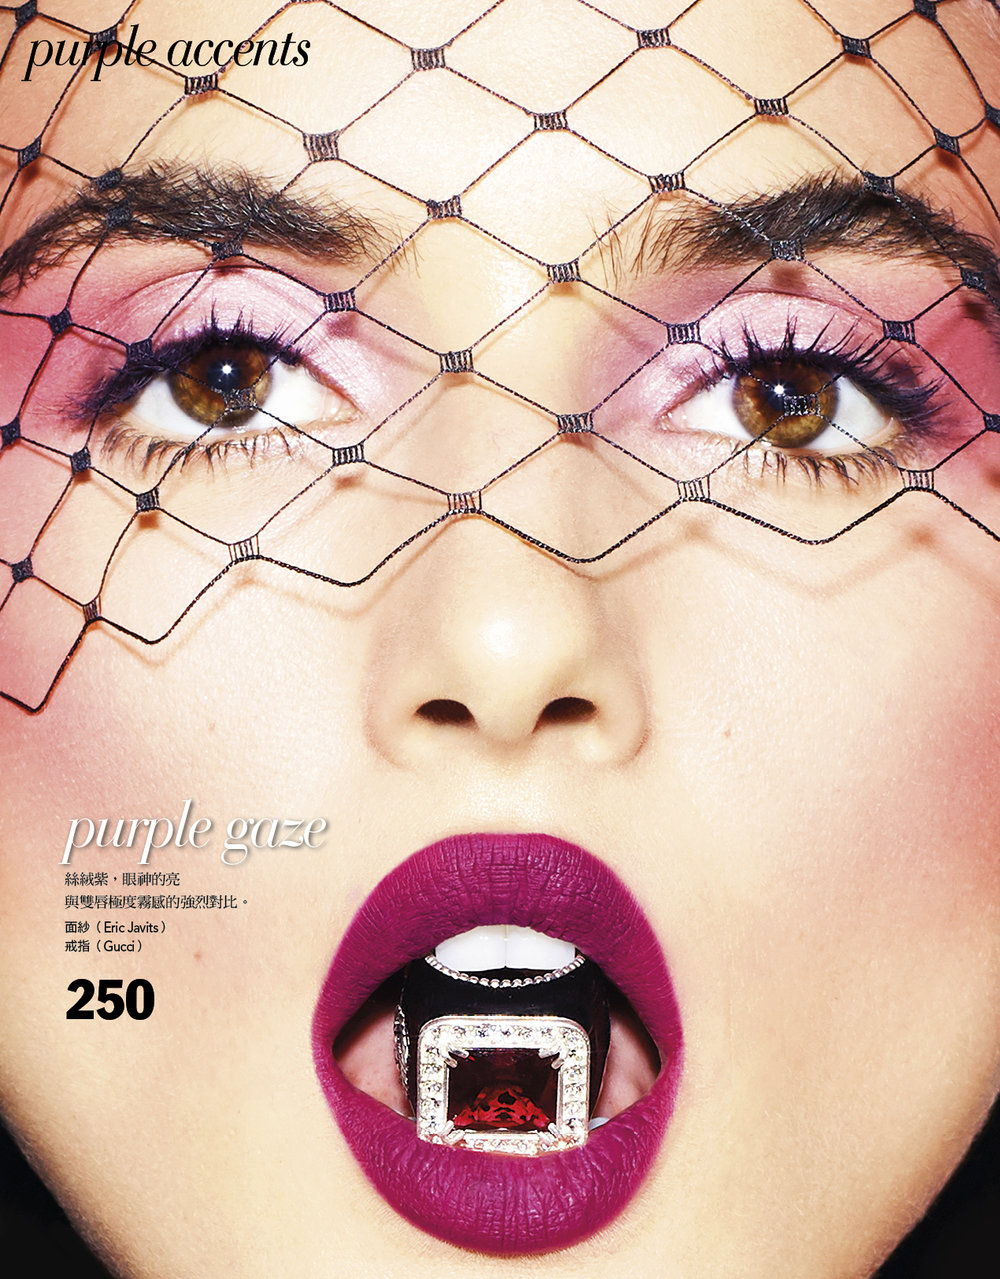 Blanca Padilla for VOGUE Taiwan by Enrique Vega [Layout]4.jpg